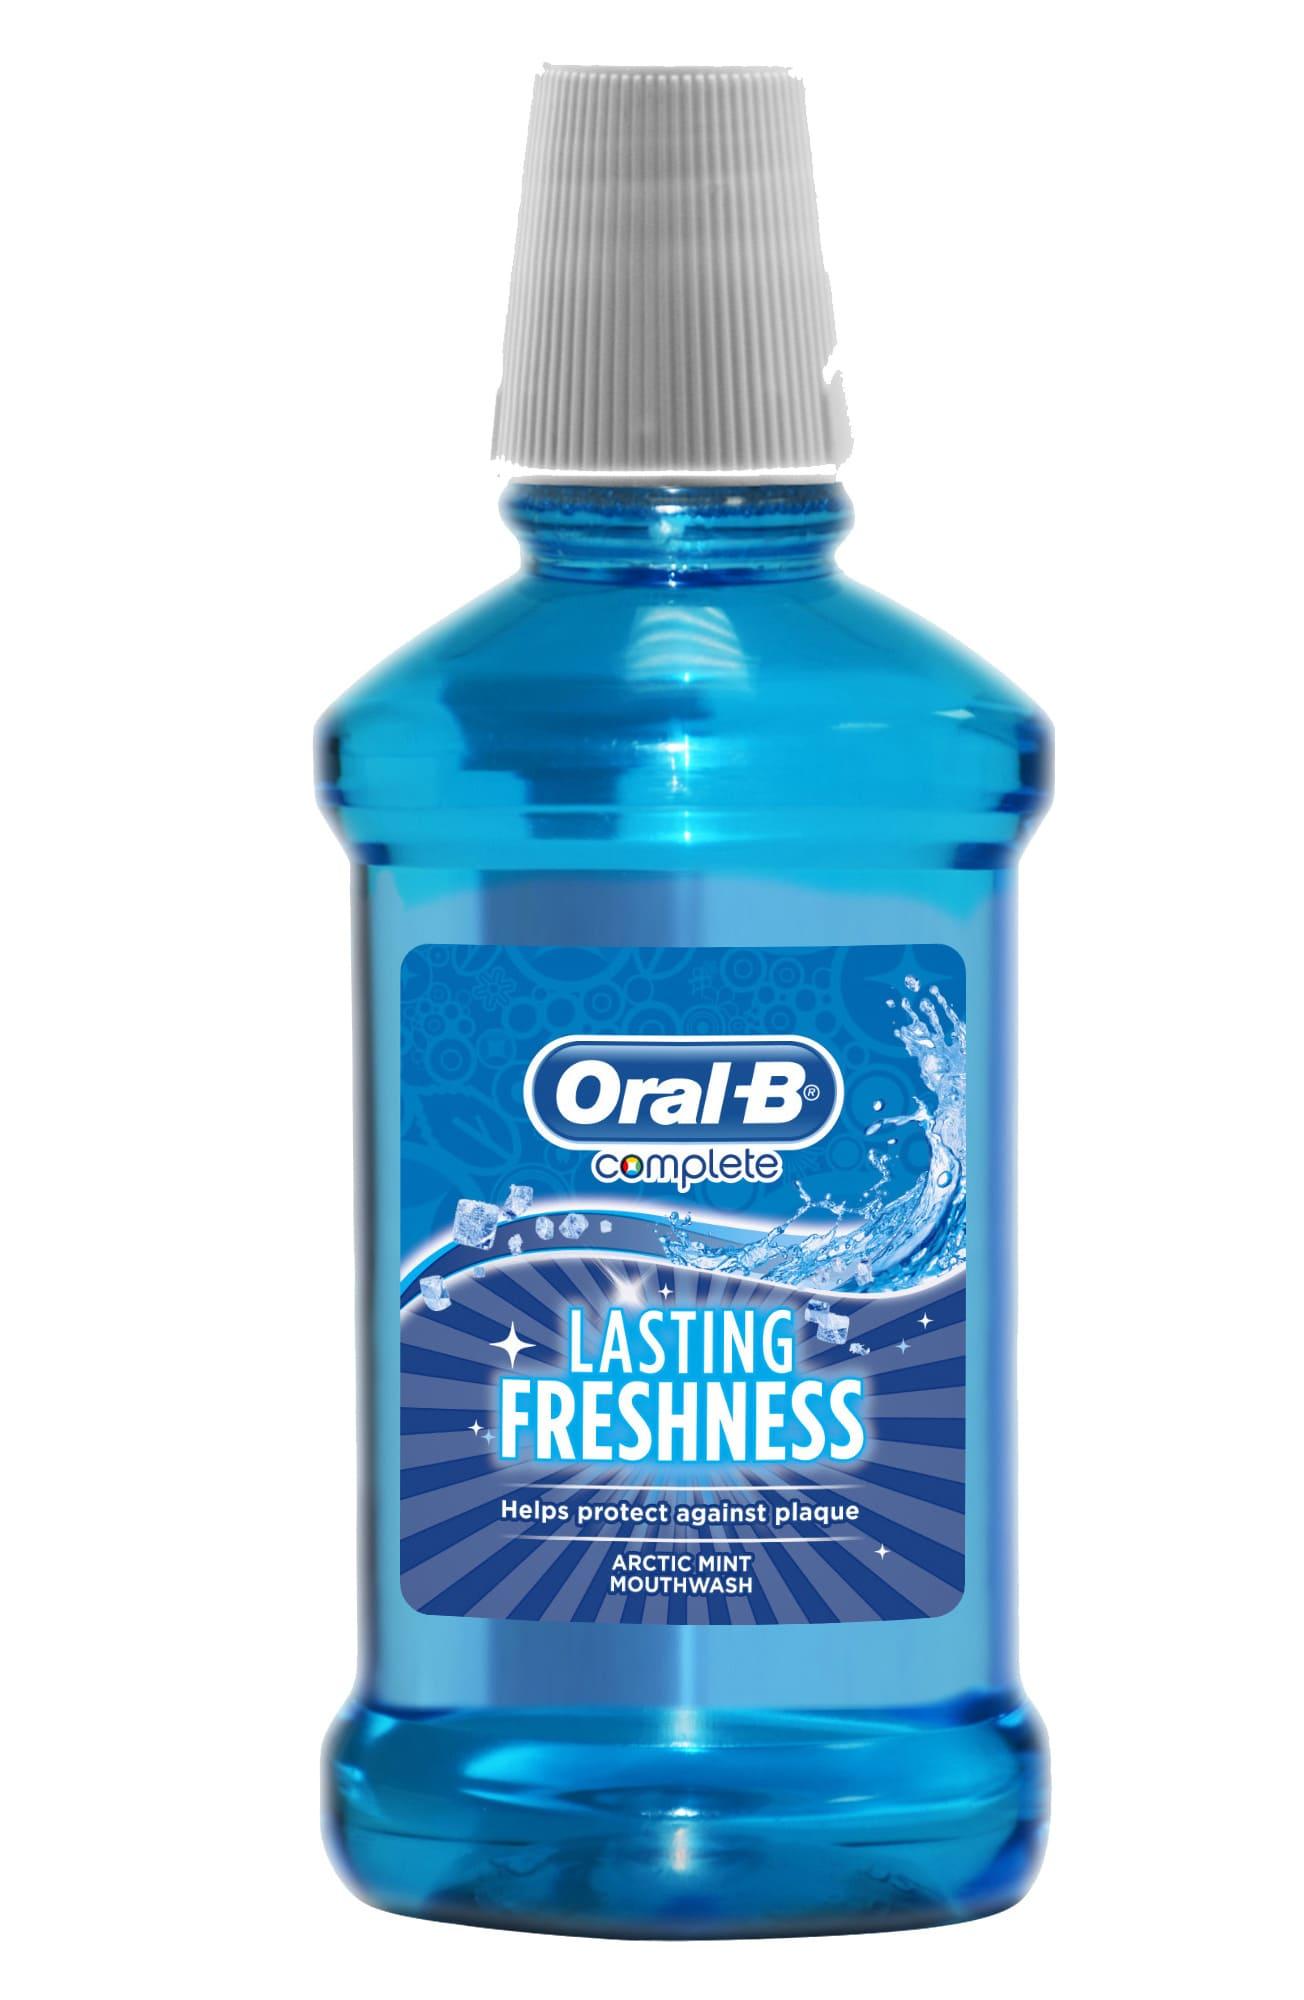 Ополаскиватель для полости рта Oral-B Комплекс Lasting Freshness Arctic Mint 250мл мексидол дент ополаскиватель professional для рта 200мл